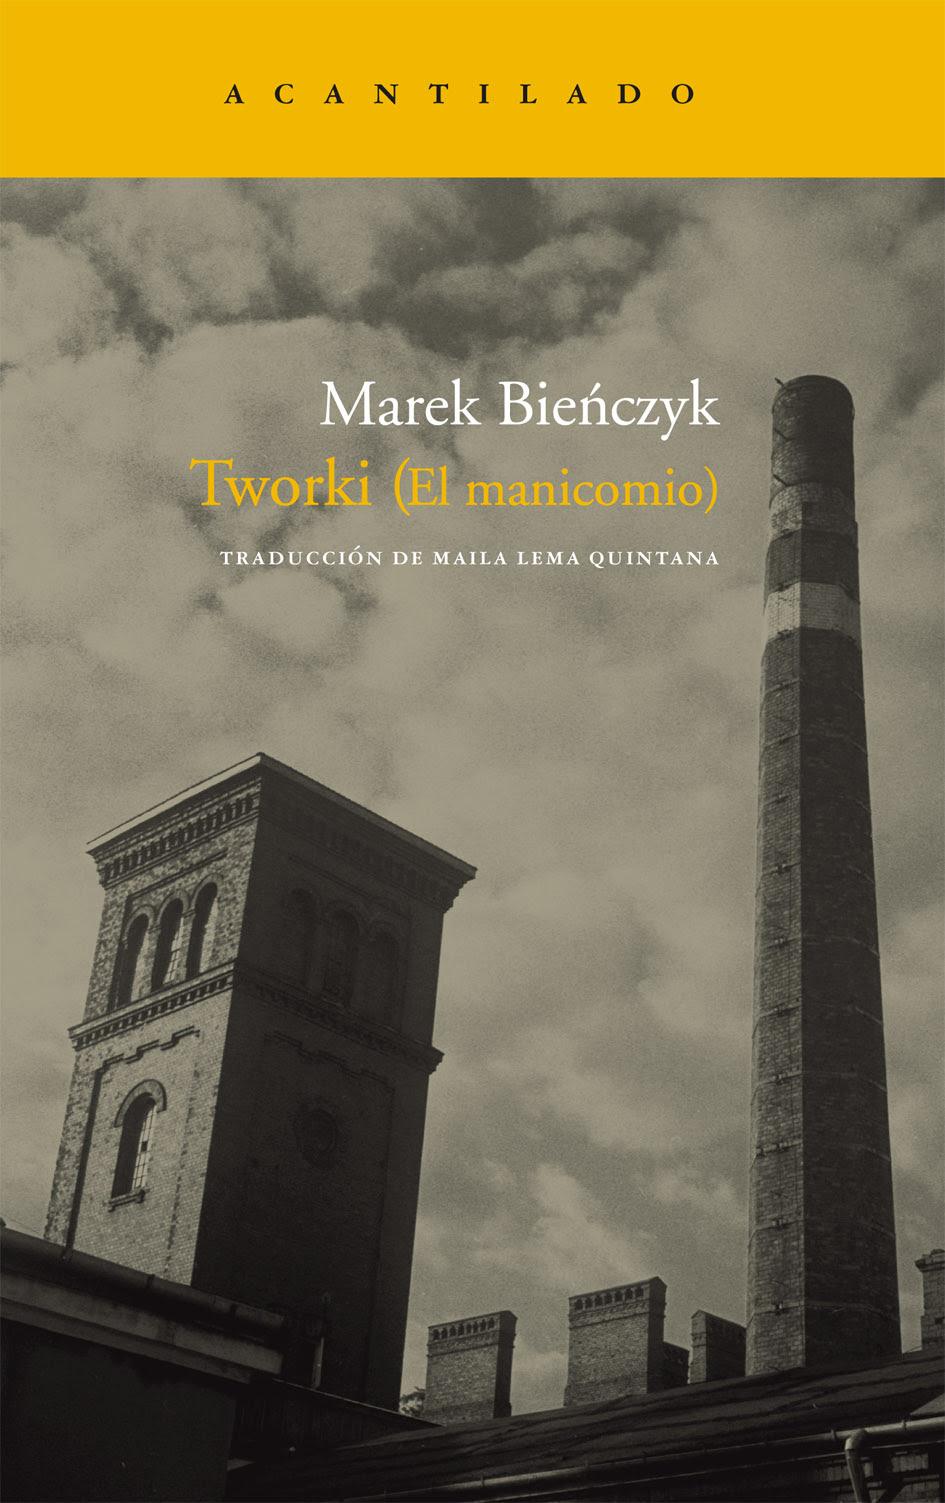 http://loqueleolocuento.blogspot.com.es/2015/09/tworki-el-manicomio-marek-bienczyk.html